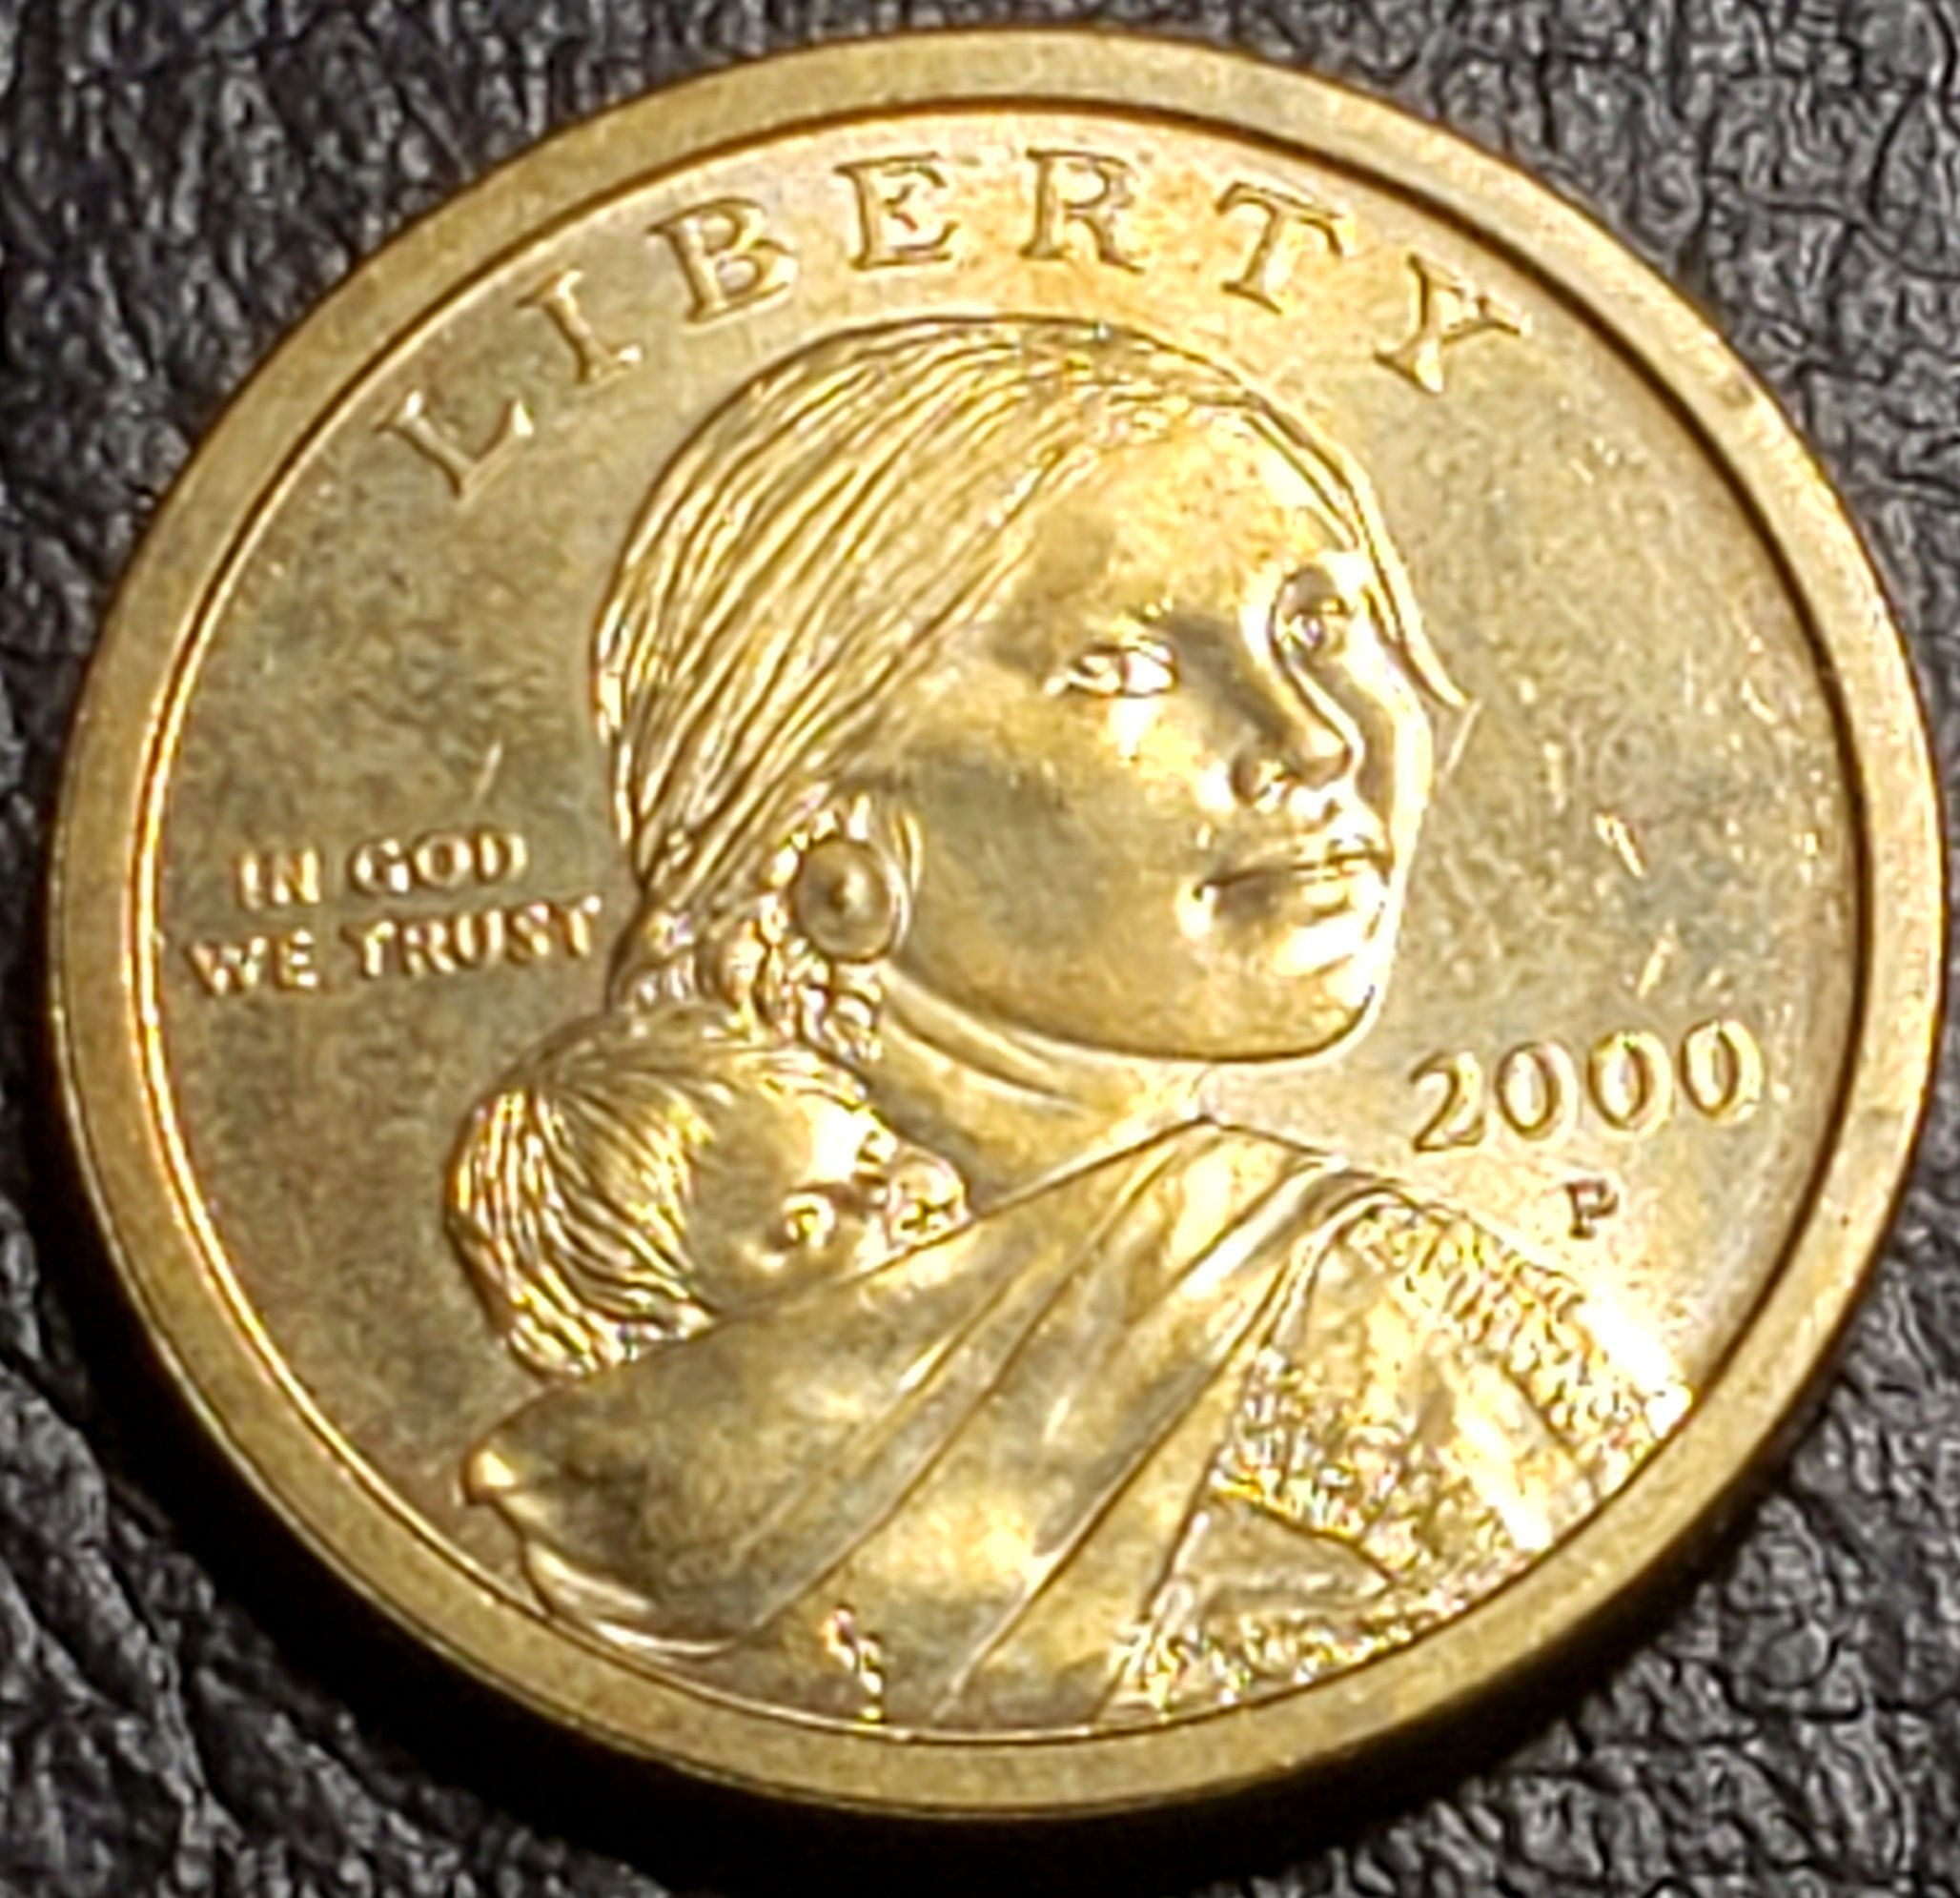 Vintage Dollar Sacagawea Dollarcopper Coin Etsy In 2020 Sacagawea Dollar Silver Coins Worth Sacagawea